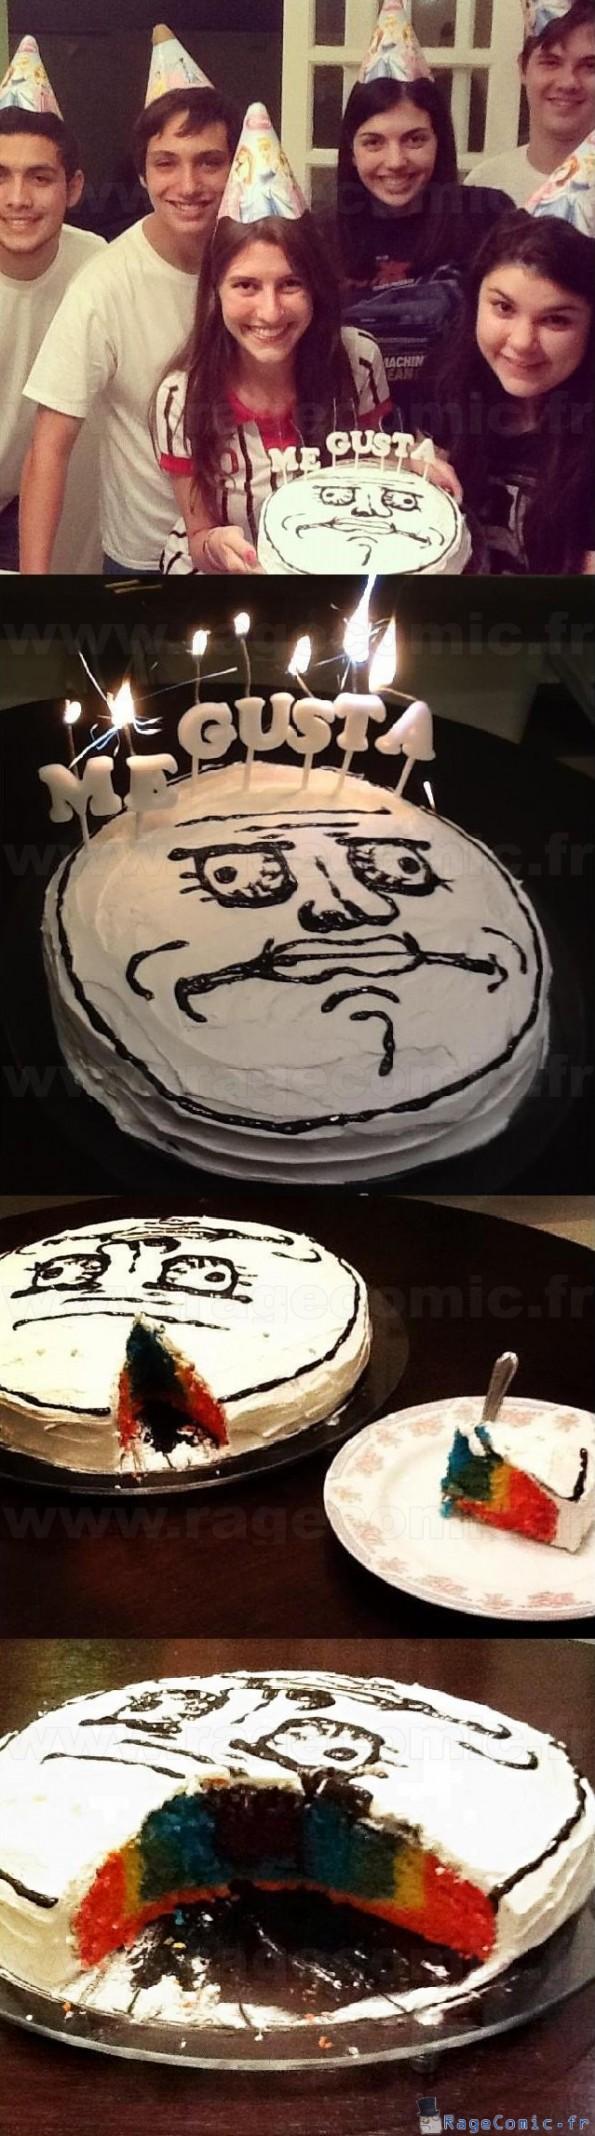 Me gusta gâteau arc-en-ciel